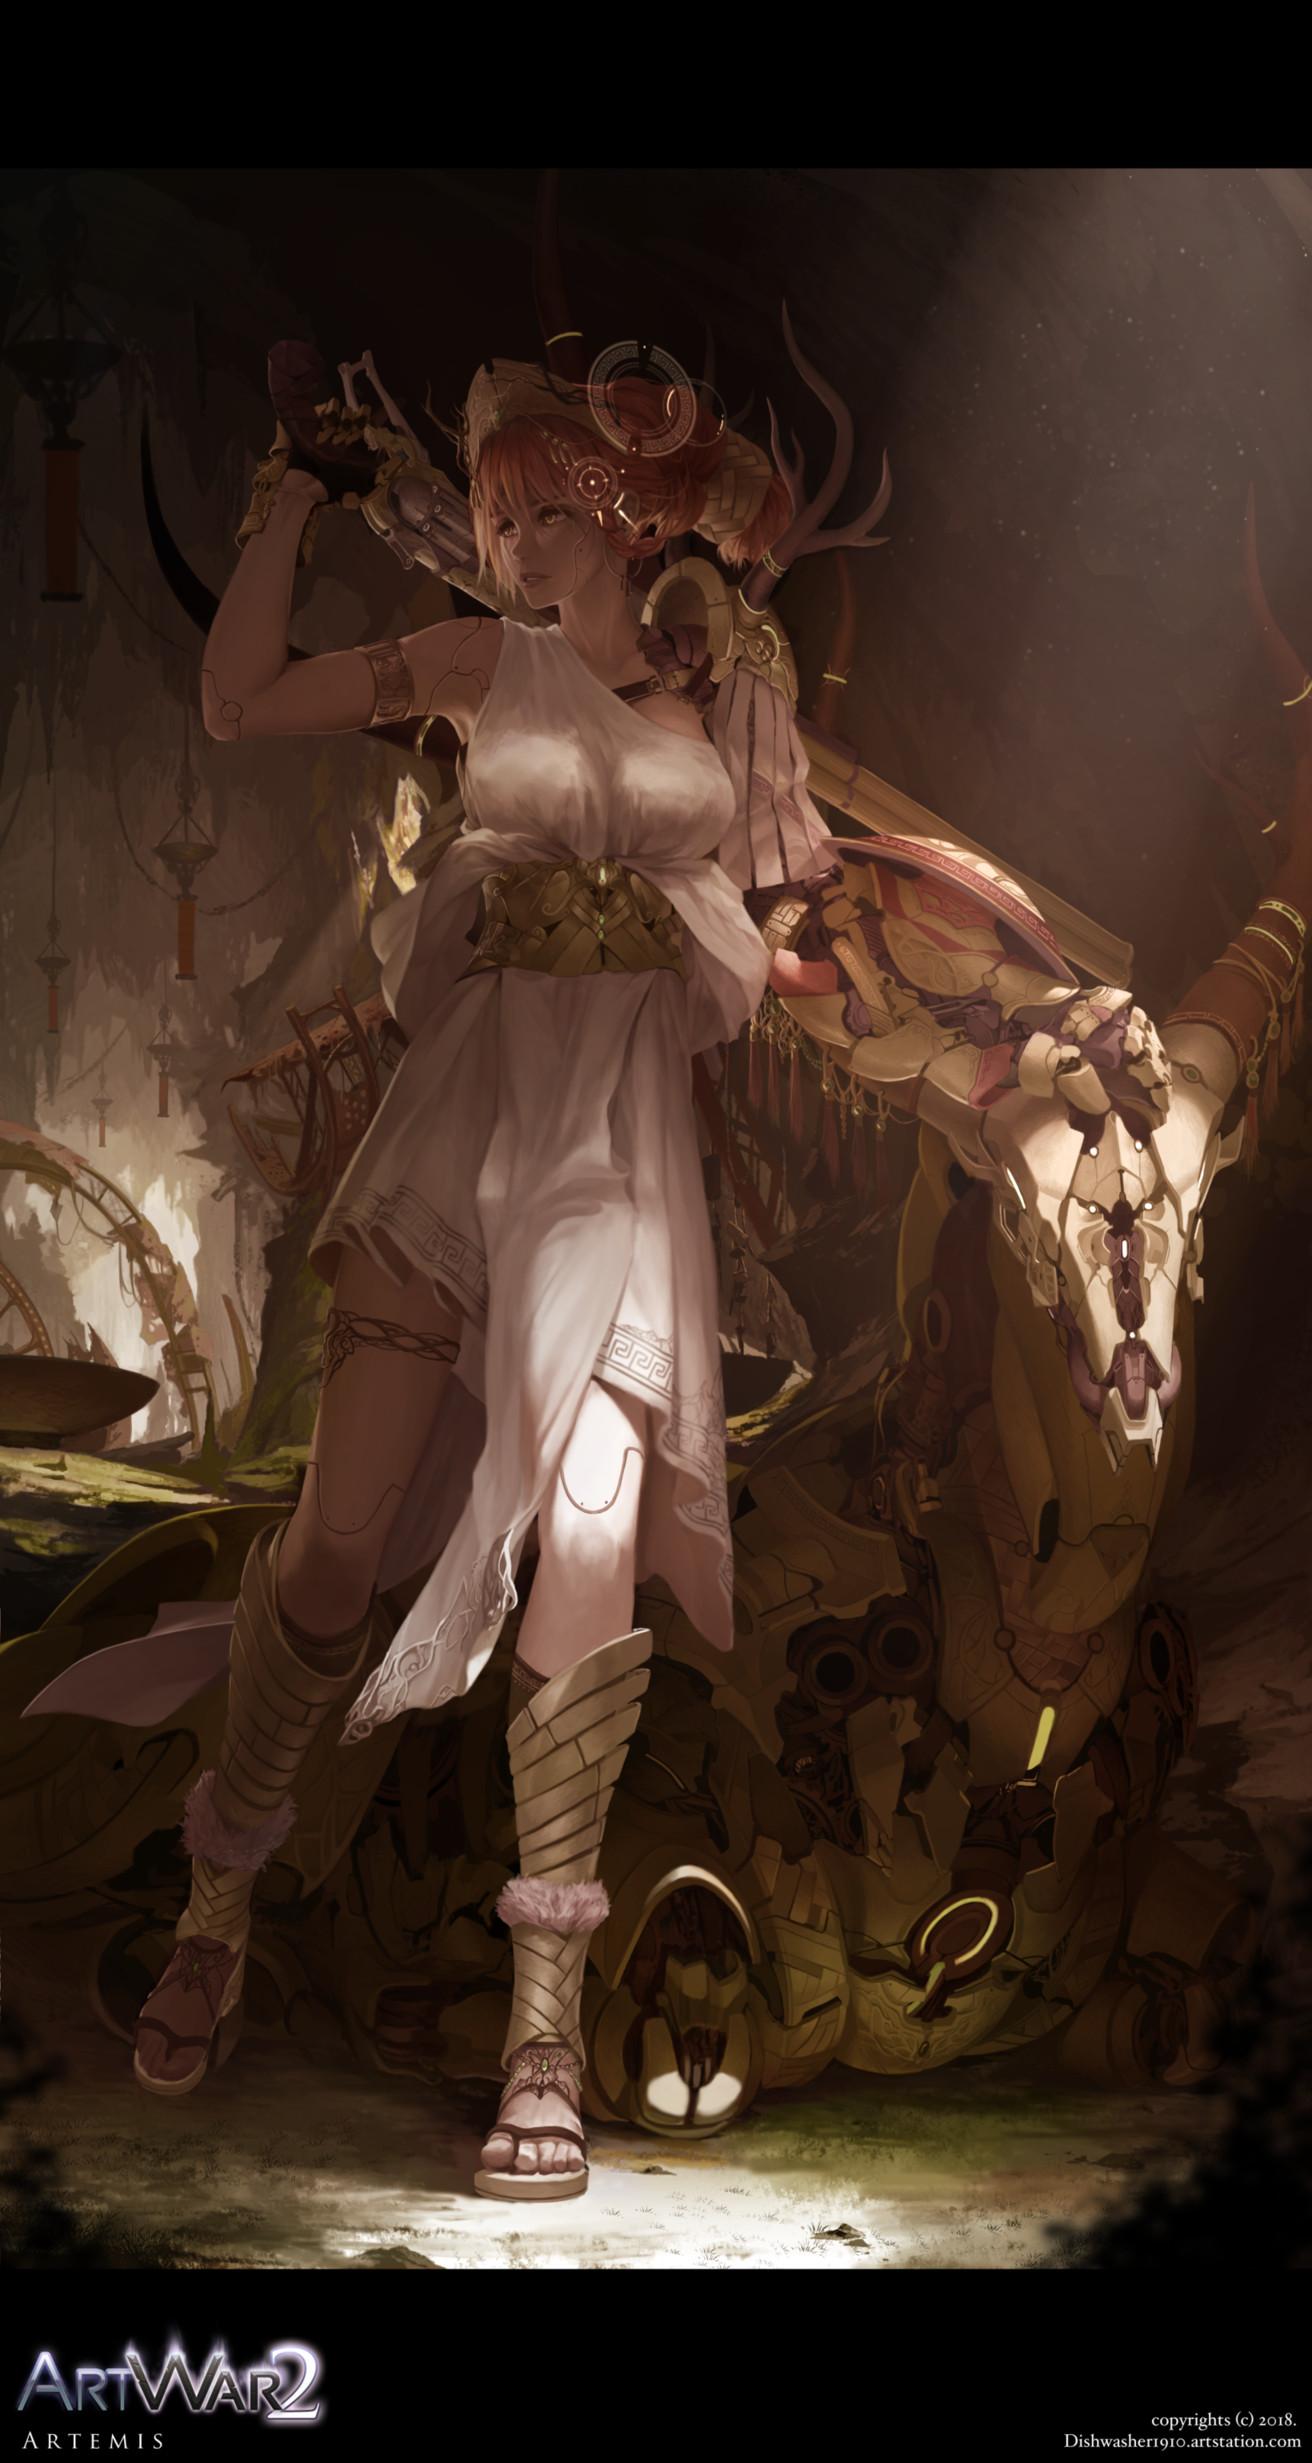 ArtStation - ARTWAR 2: Artemis , Bach Do